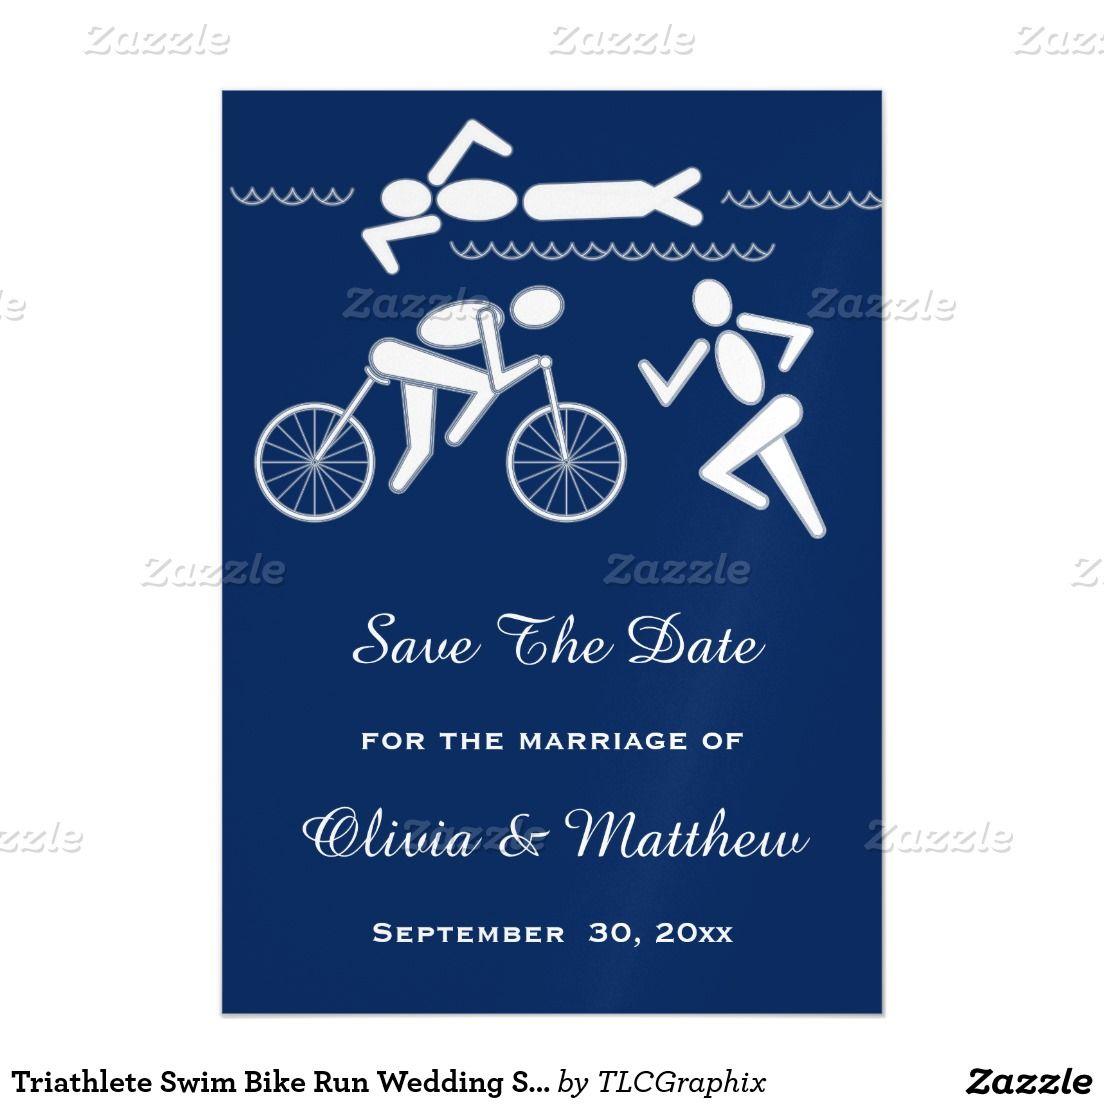 triathlete swim bike run wedding save the date magnetic invitation